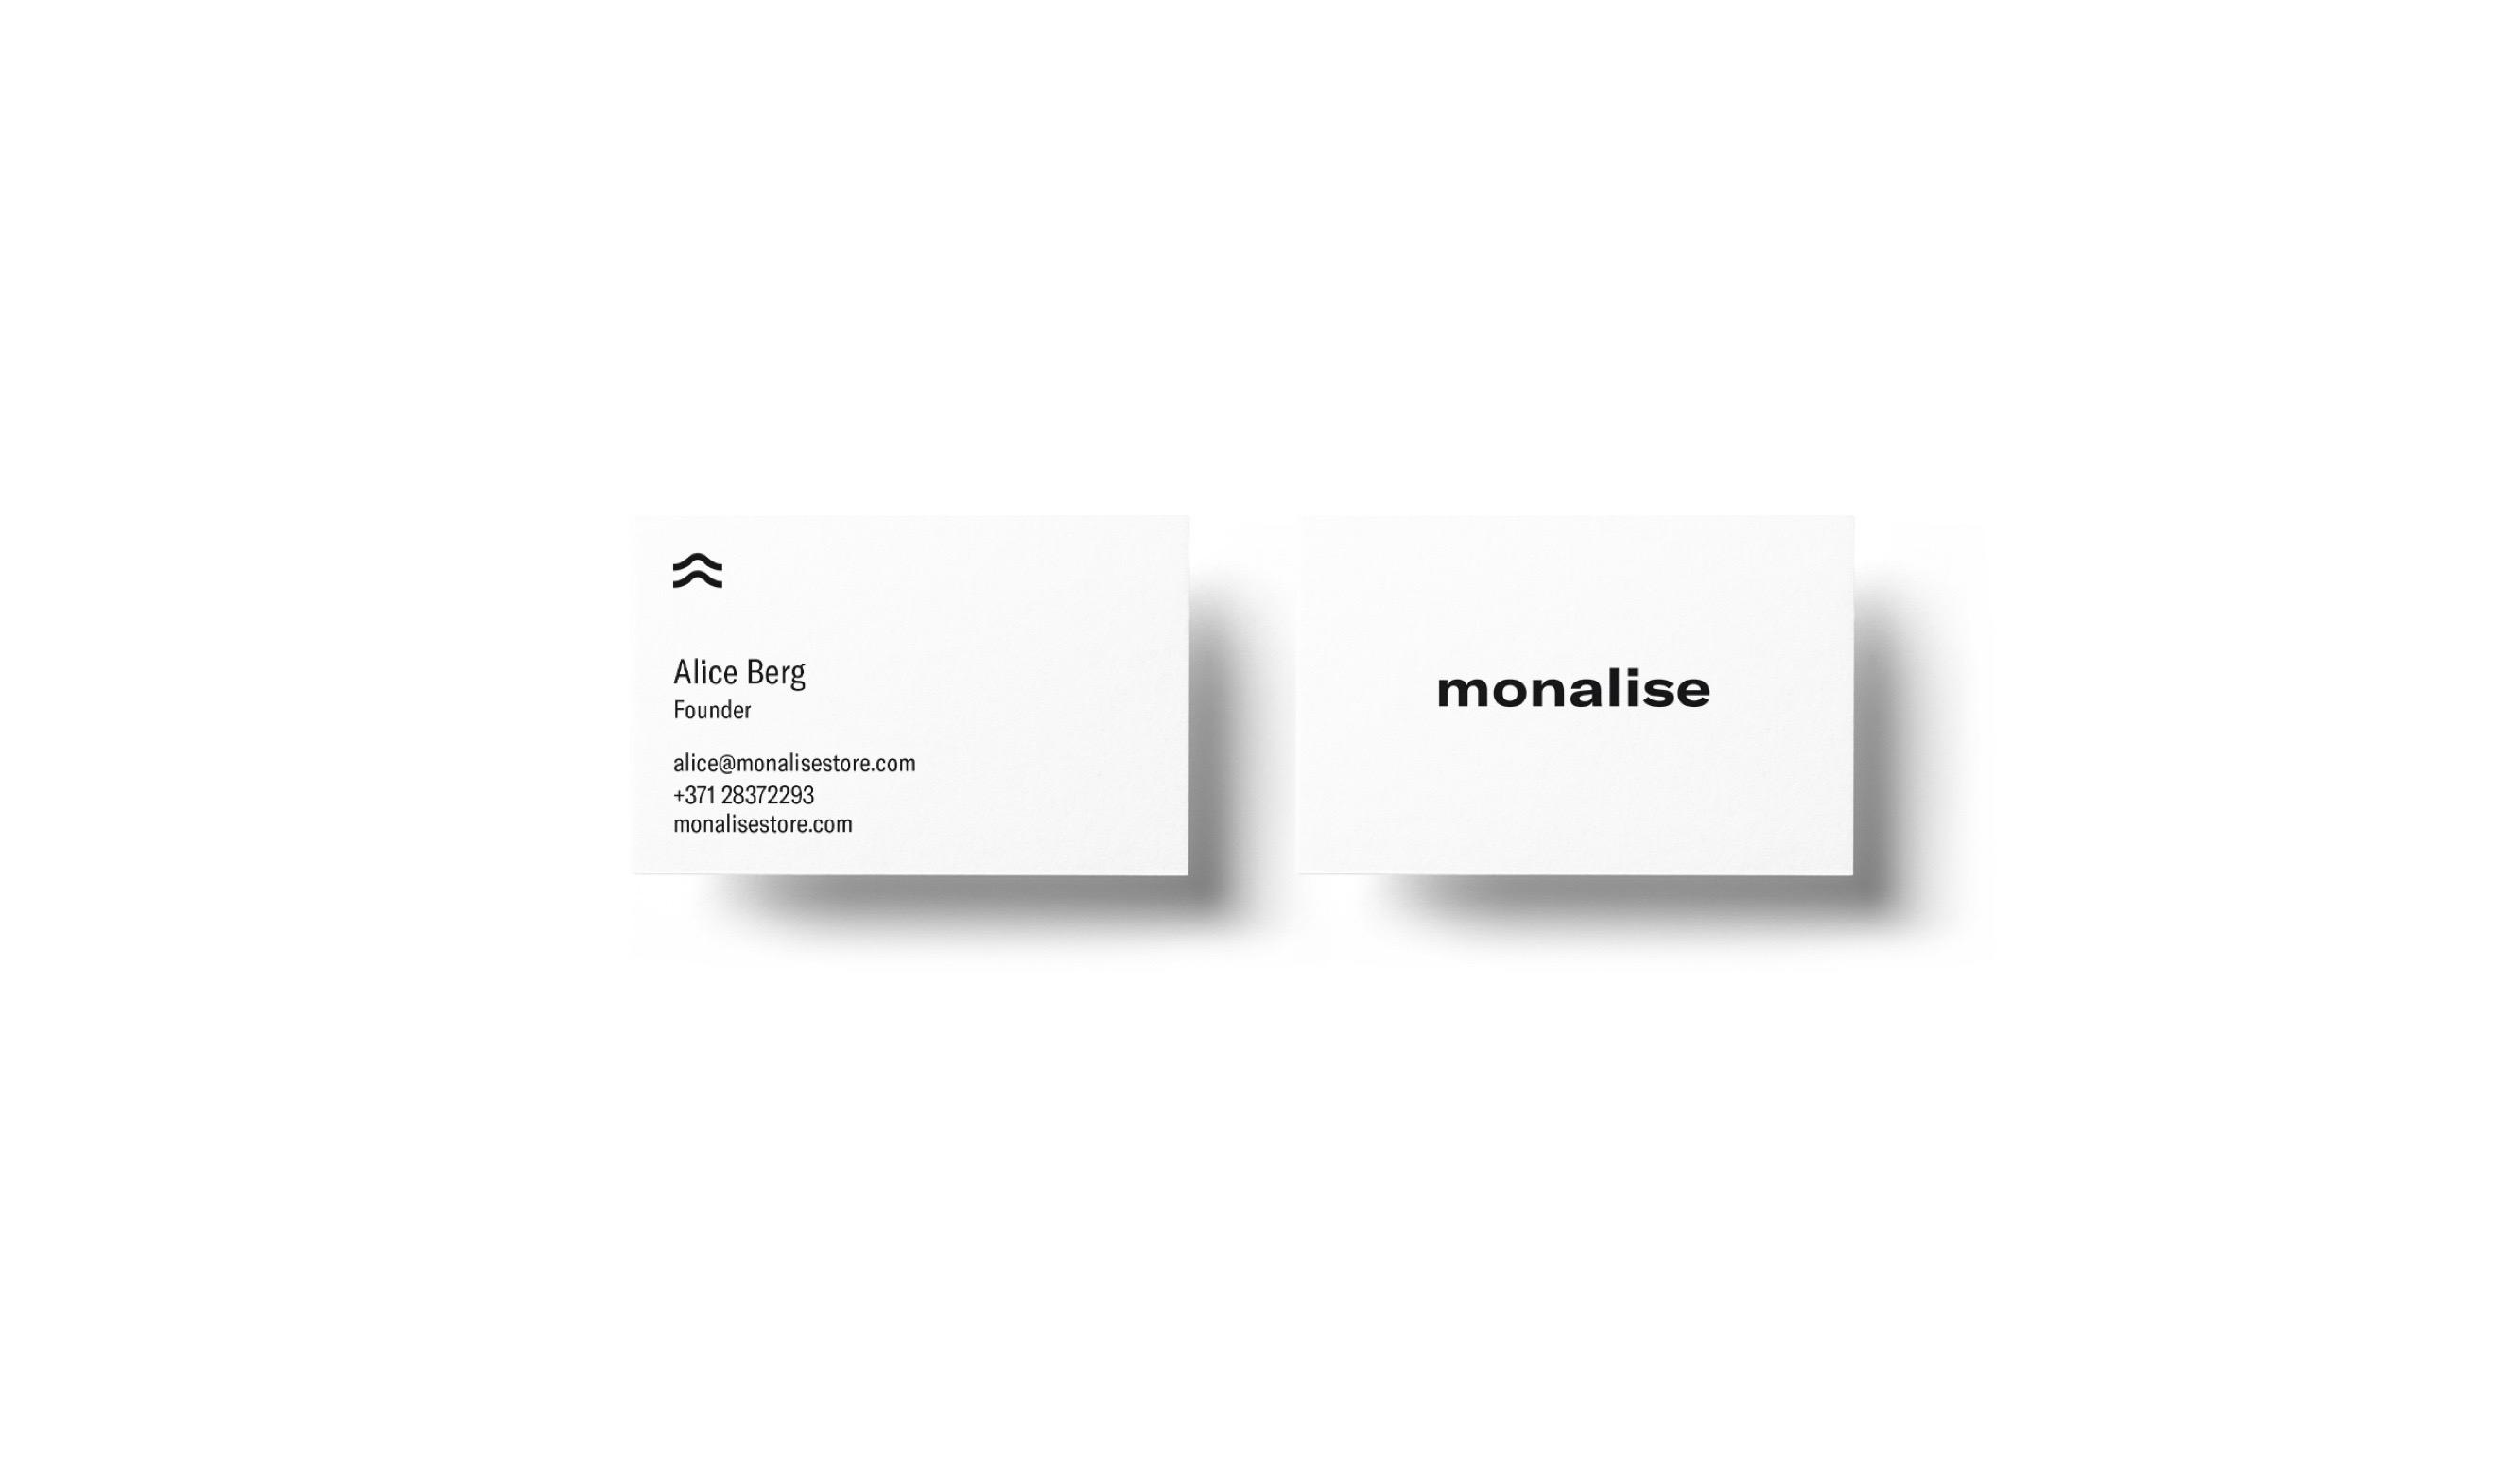 Monalise